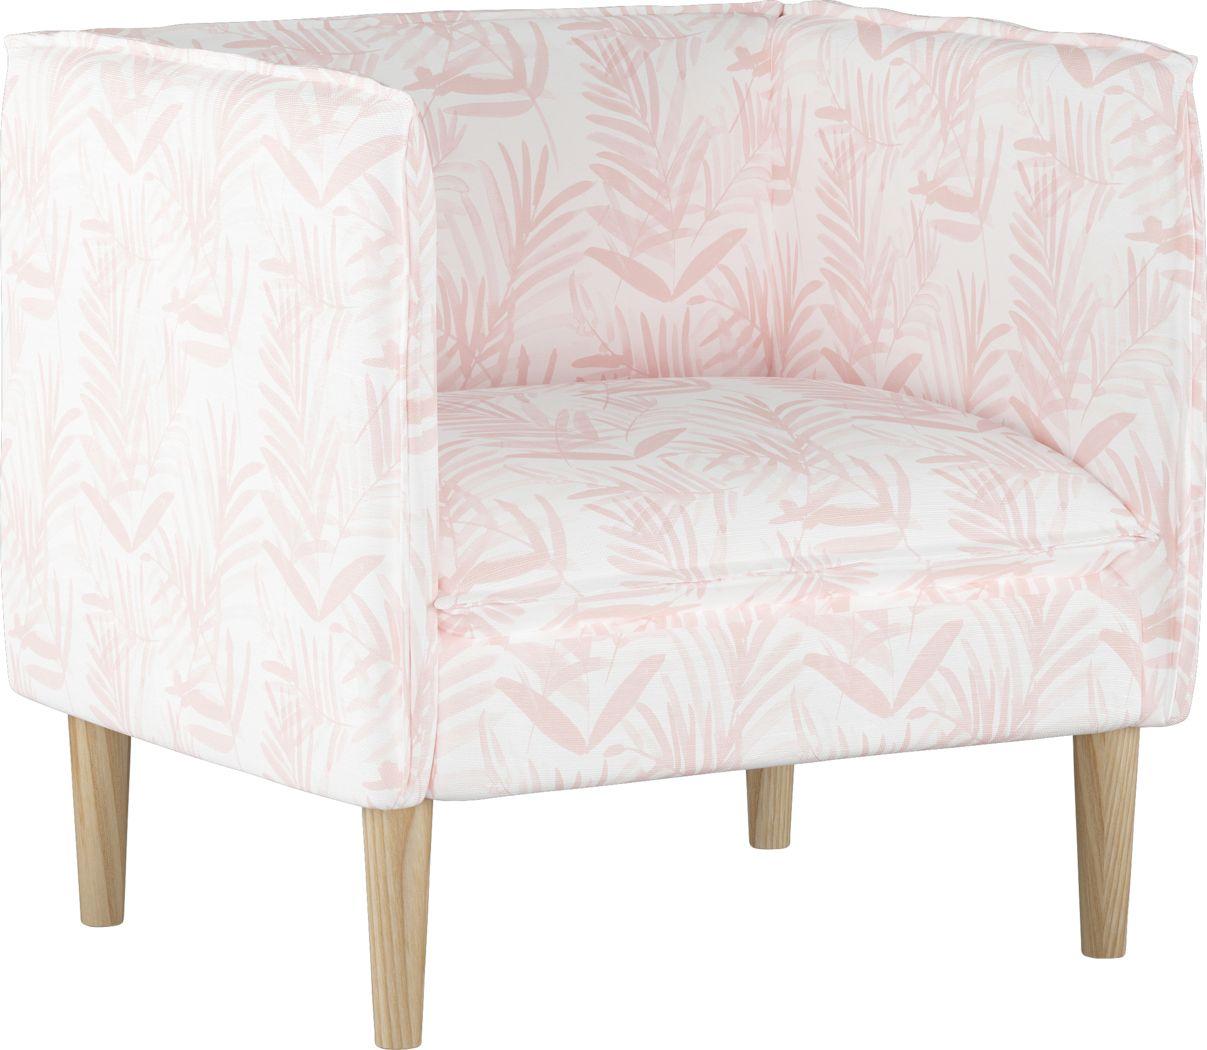 Fern Grove Pink Accent Chair